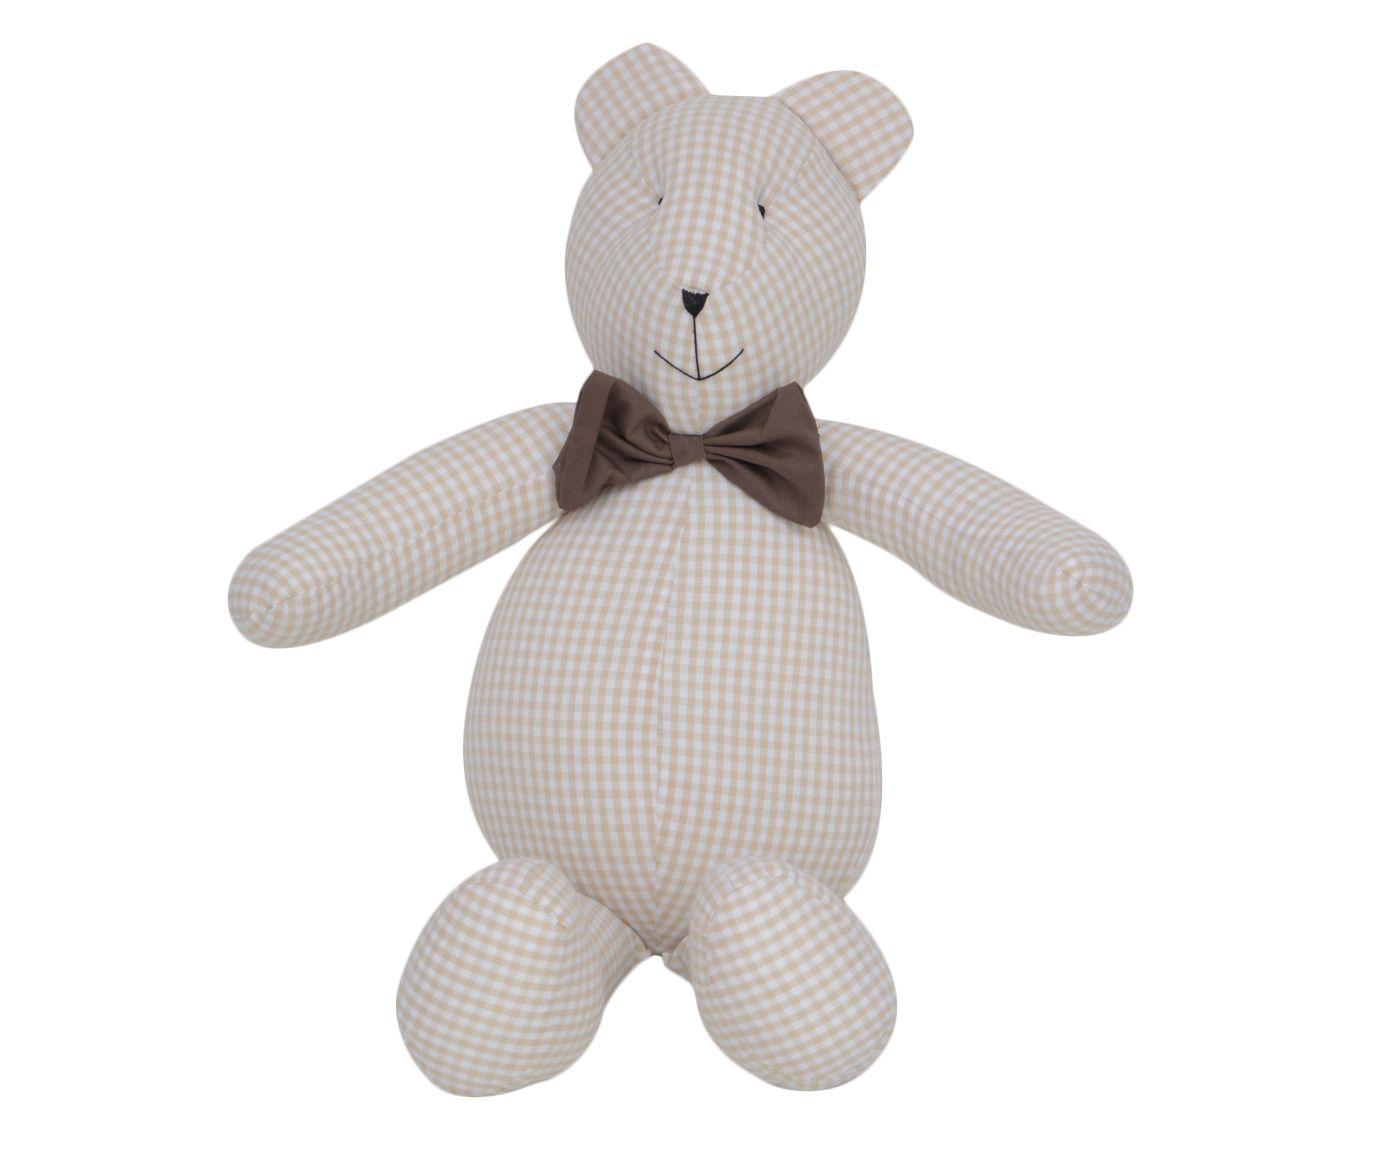 Boneco Urso Teddy - Bege   Westwing.com.br